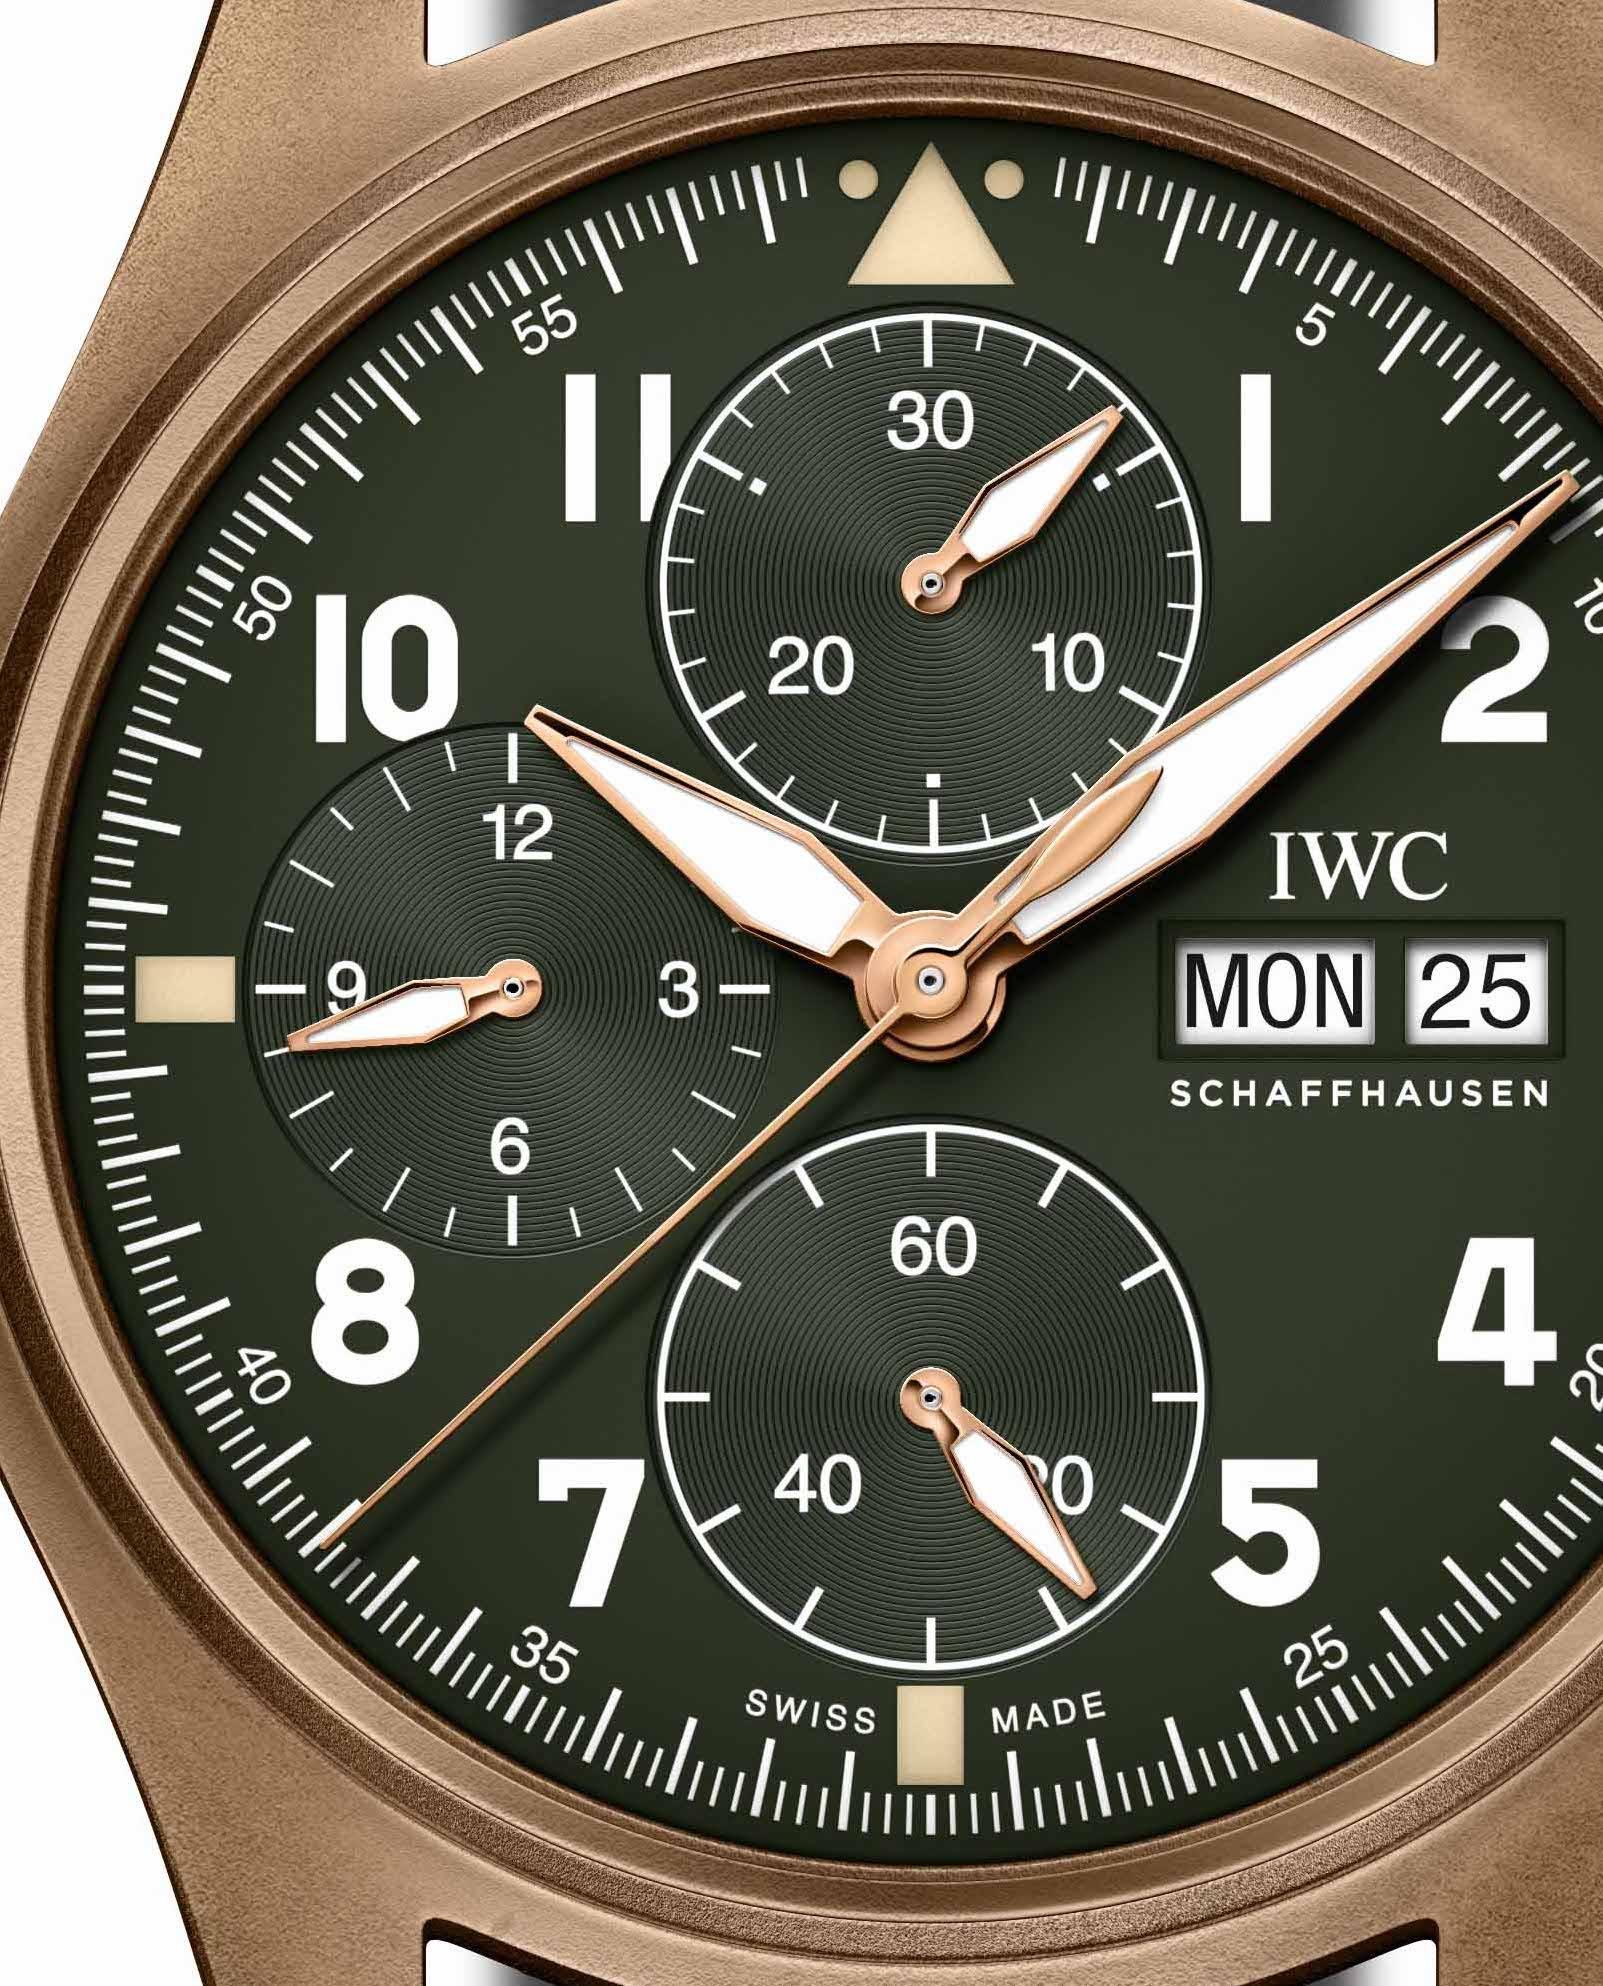 iwc-pilots-watch-chronograph-spitfire-bronze-iw387902-sihh-2019-19.jpg